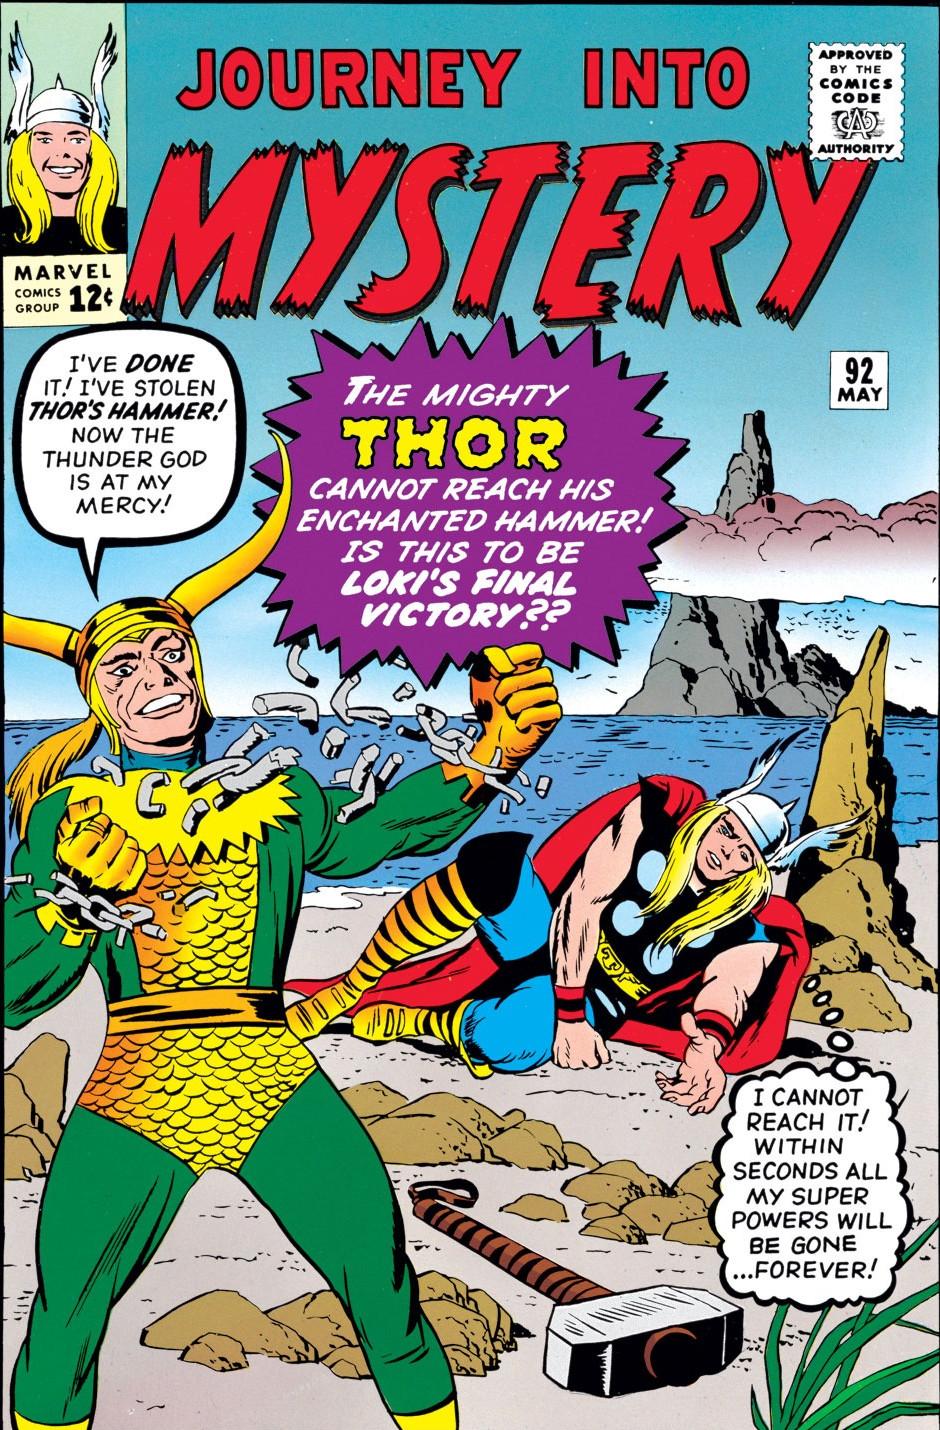 Loki - Journey Into Mistery